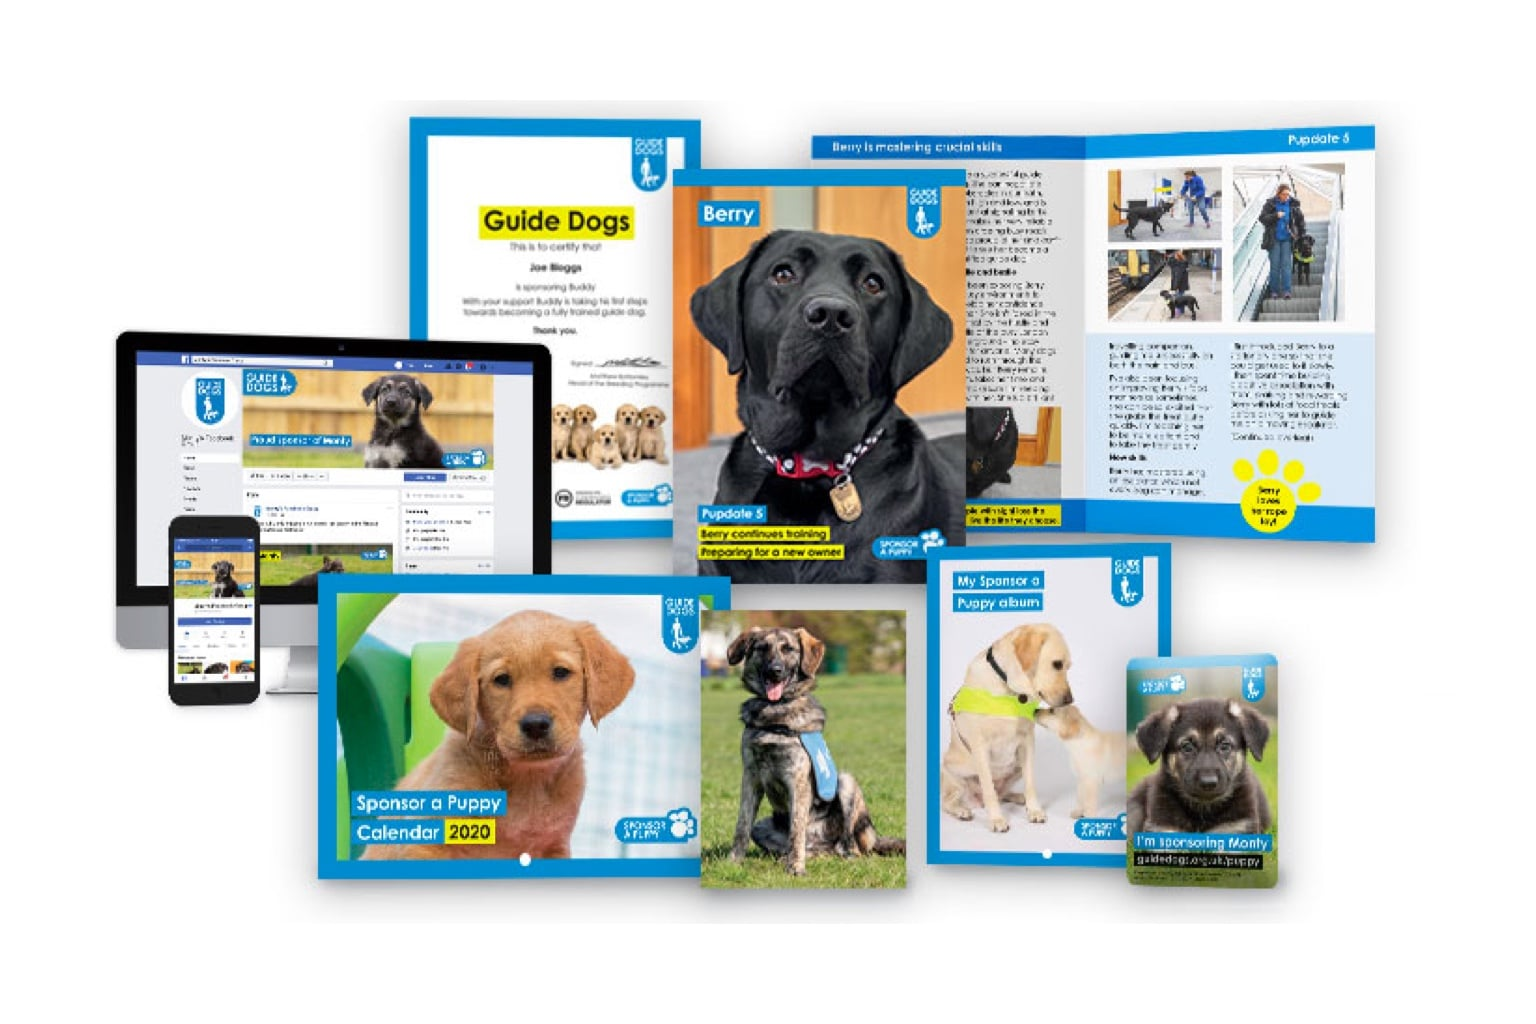 Sponsor a Puppy Hope